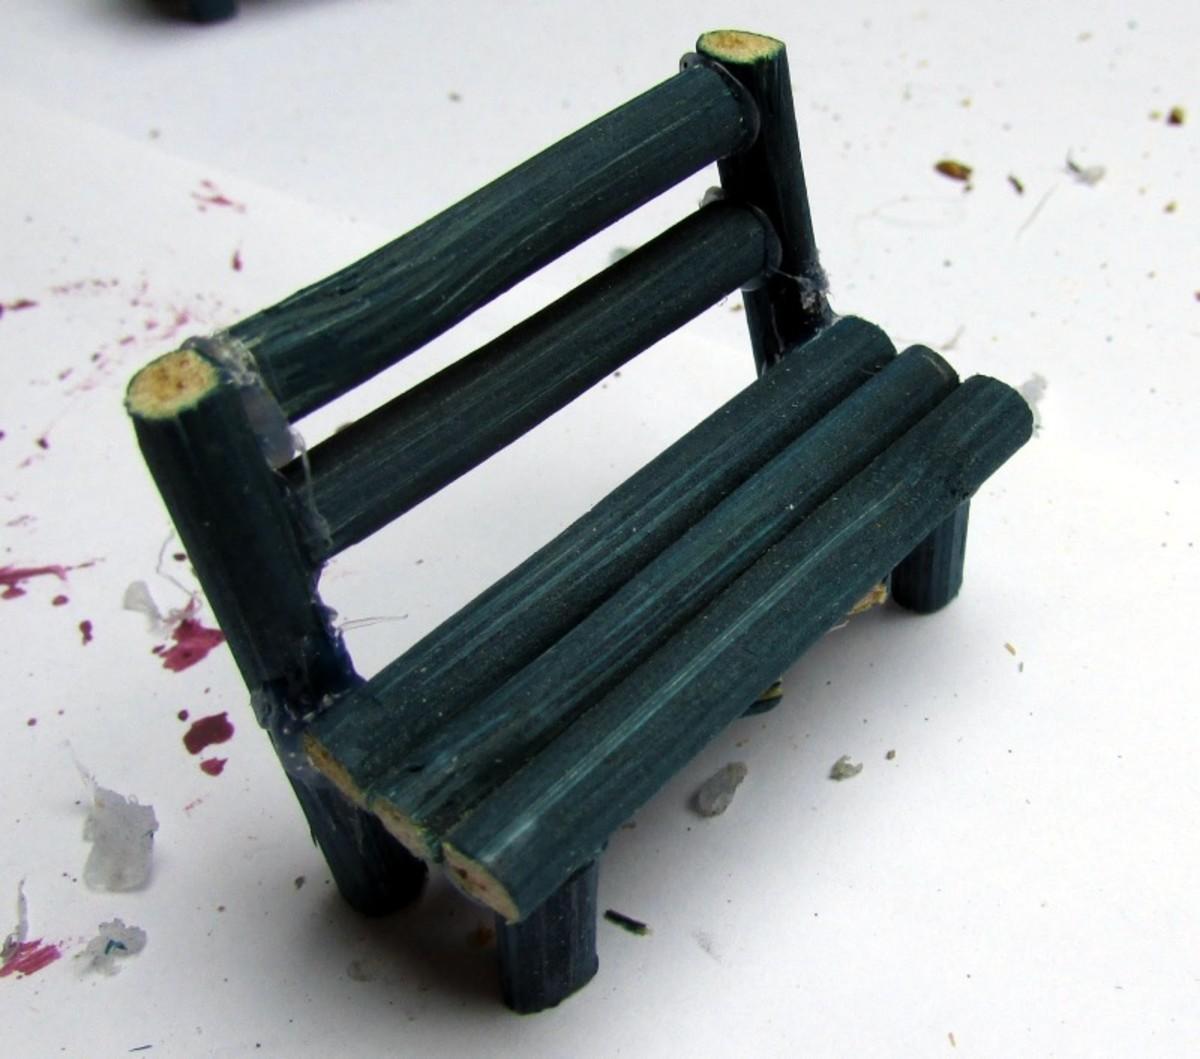 How to make a miniature bench for a fairy garden